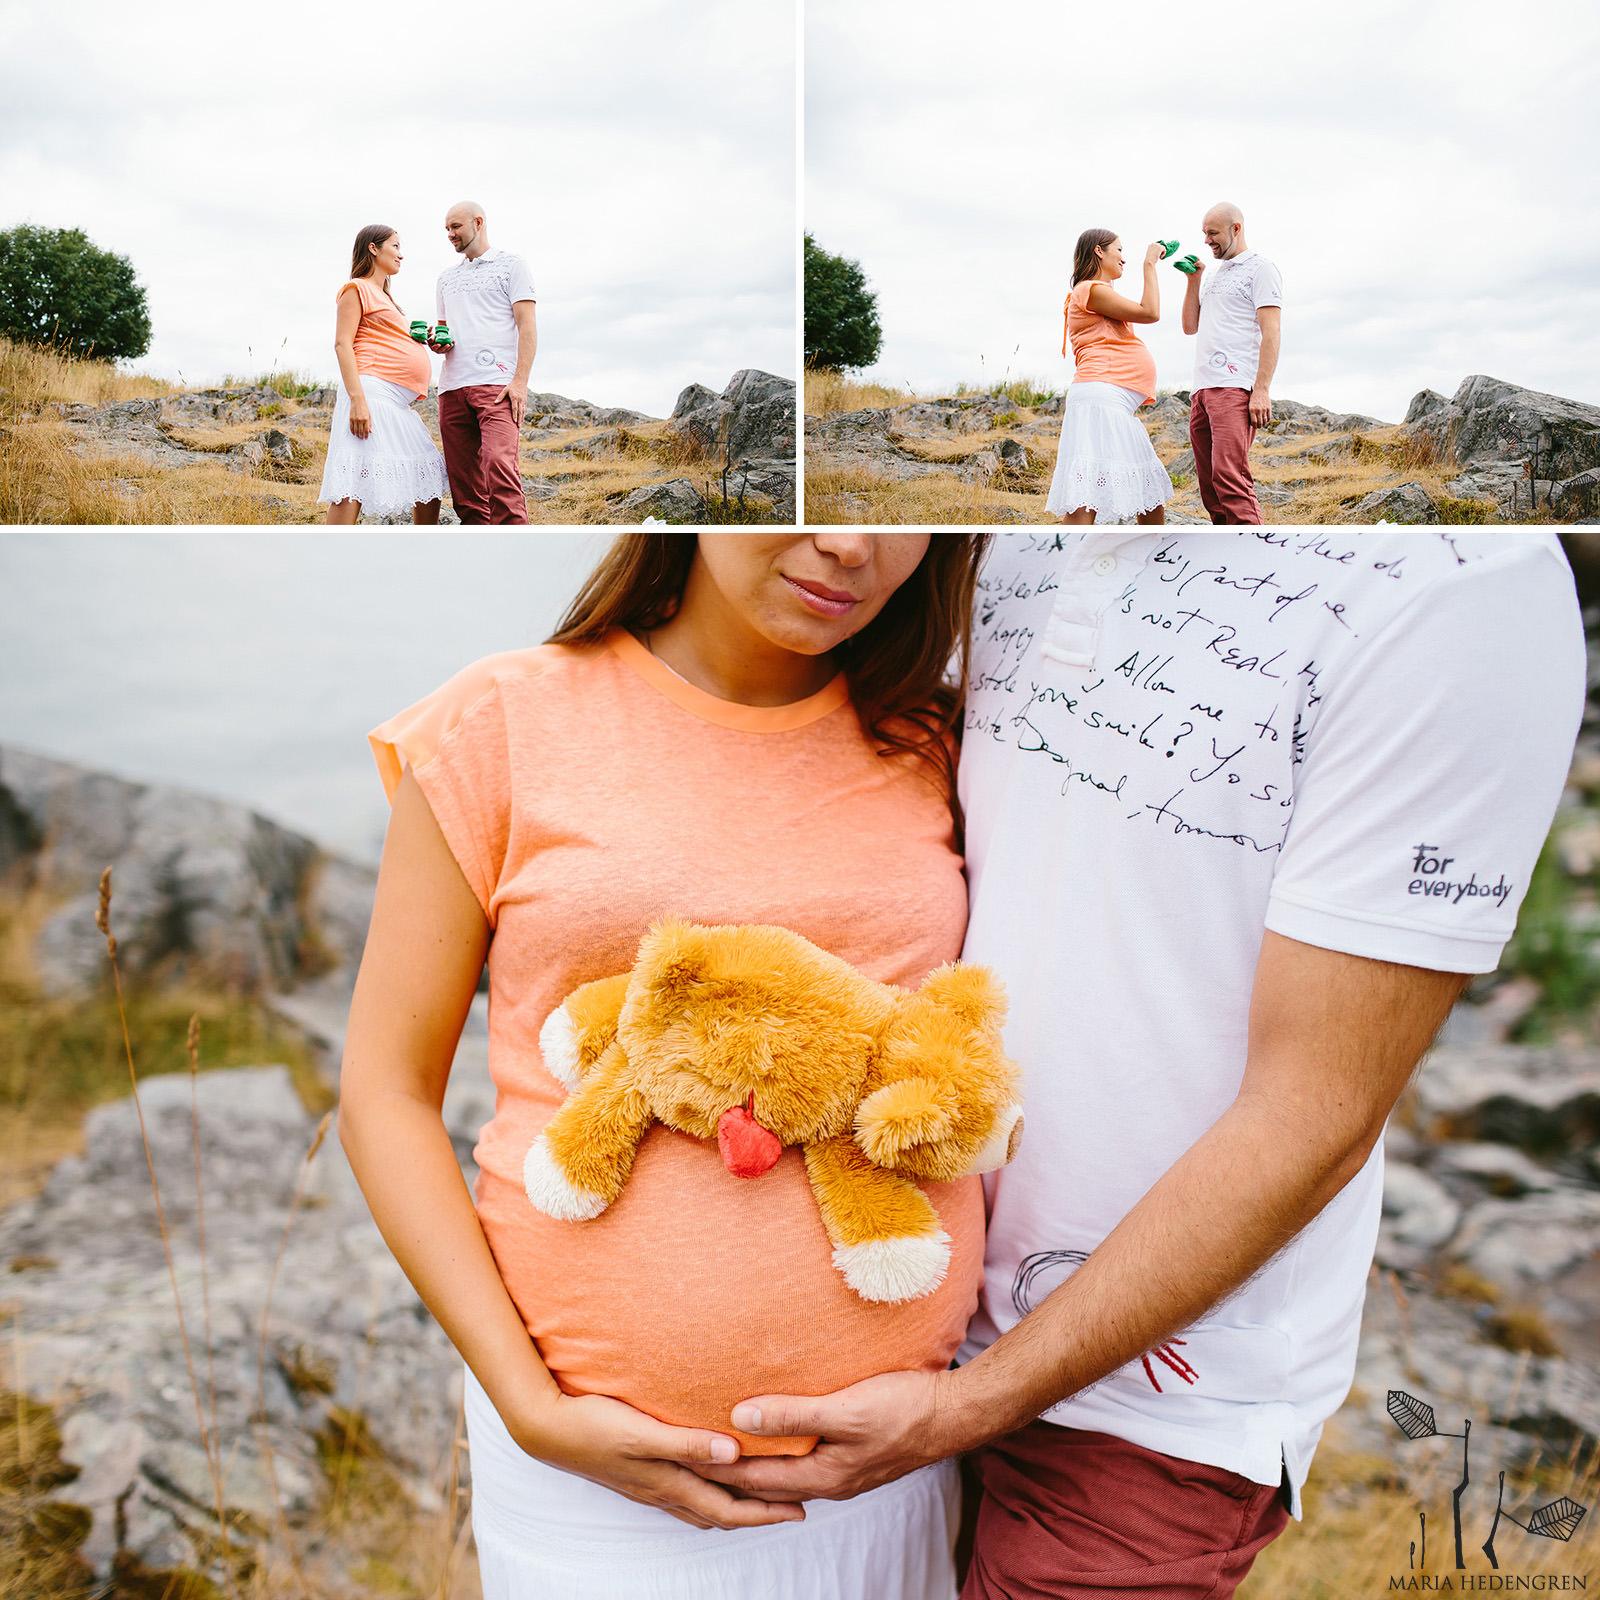 Helsinki raskausajan kuvaus